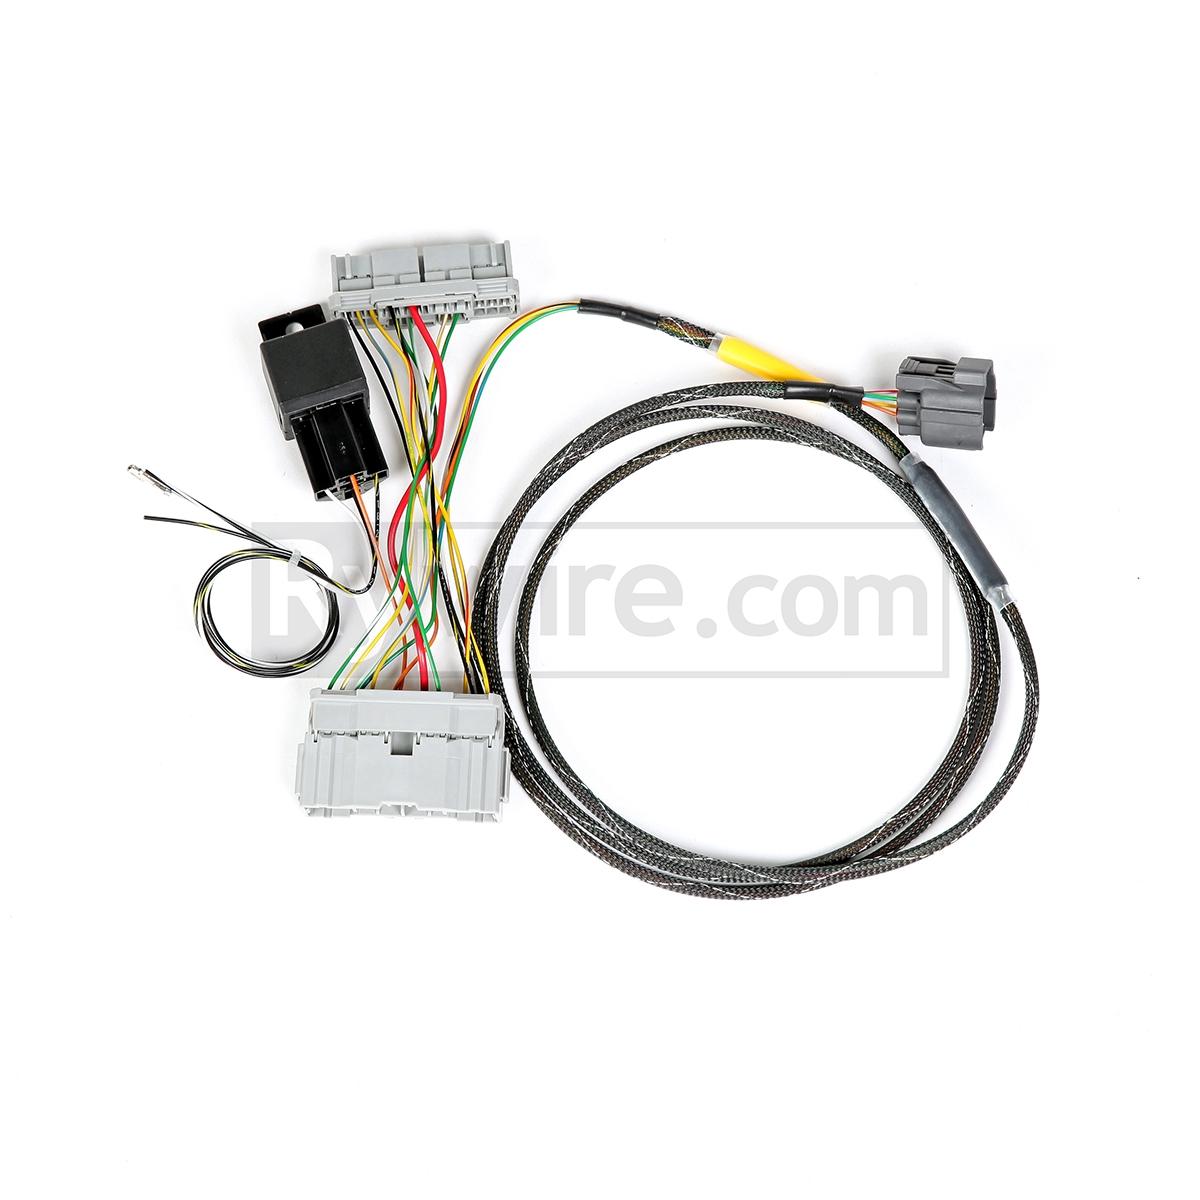 k20 wiring harness diagram